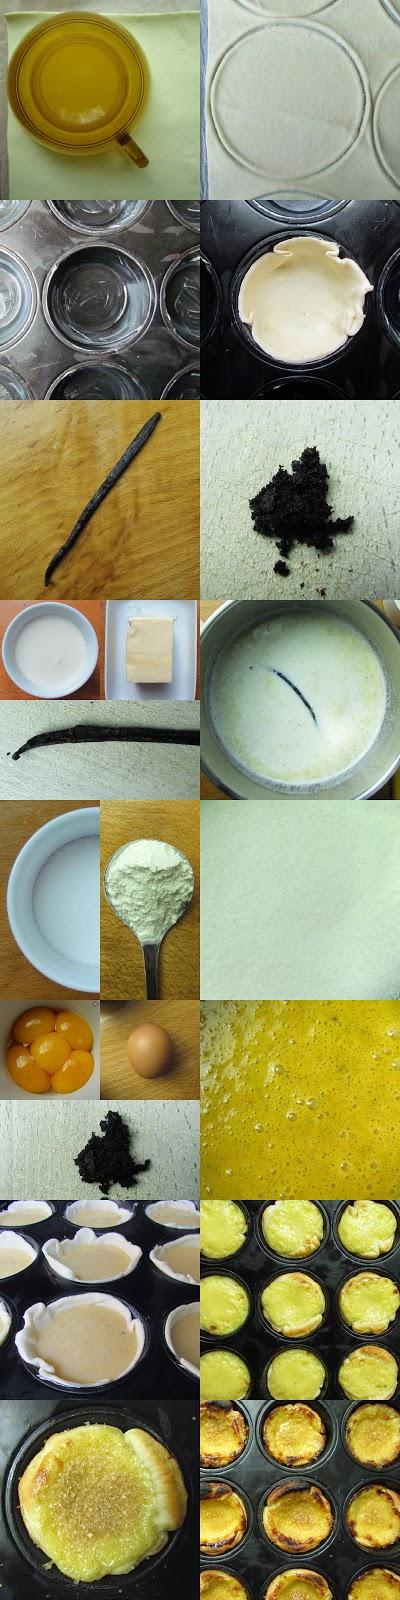 Pastel de nata recipe